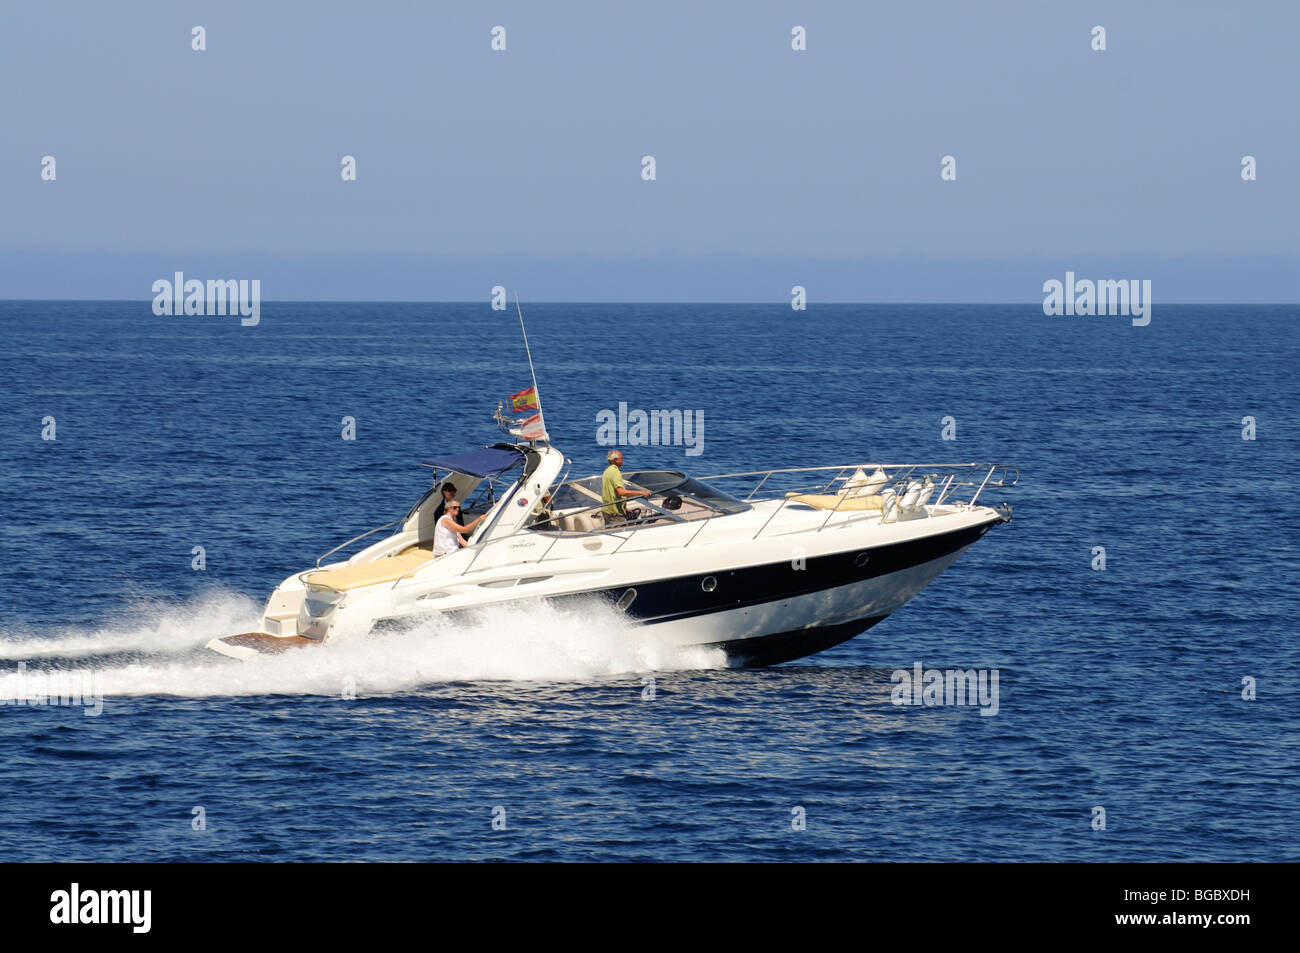 Motorboat, Ibiza, Pine Islands, Balearic Islands, Spain, Europe - Stock Image